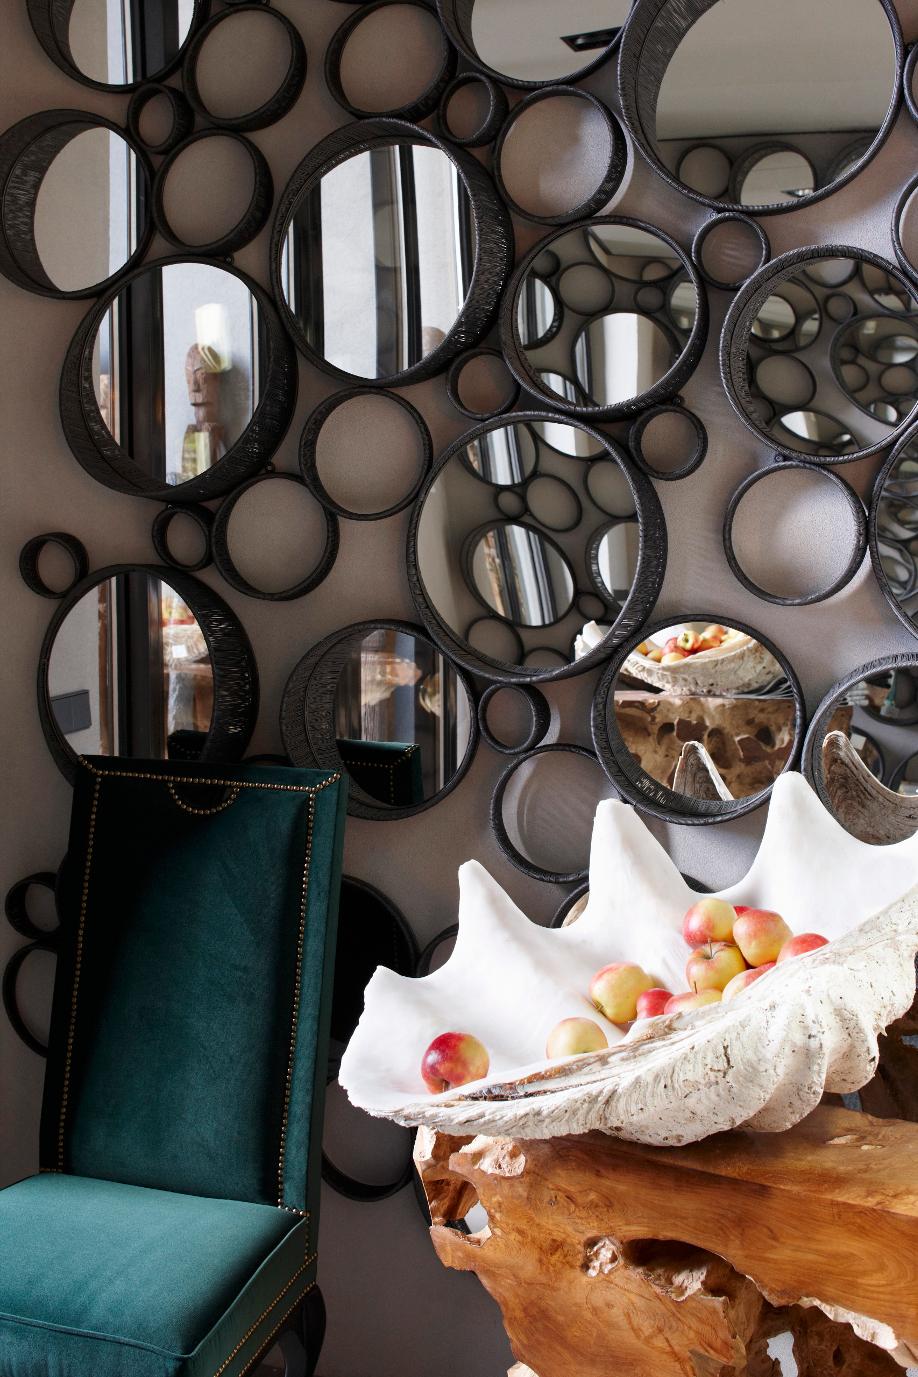 westwing-spiegel-collage-grau